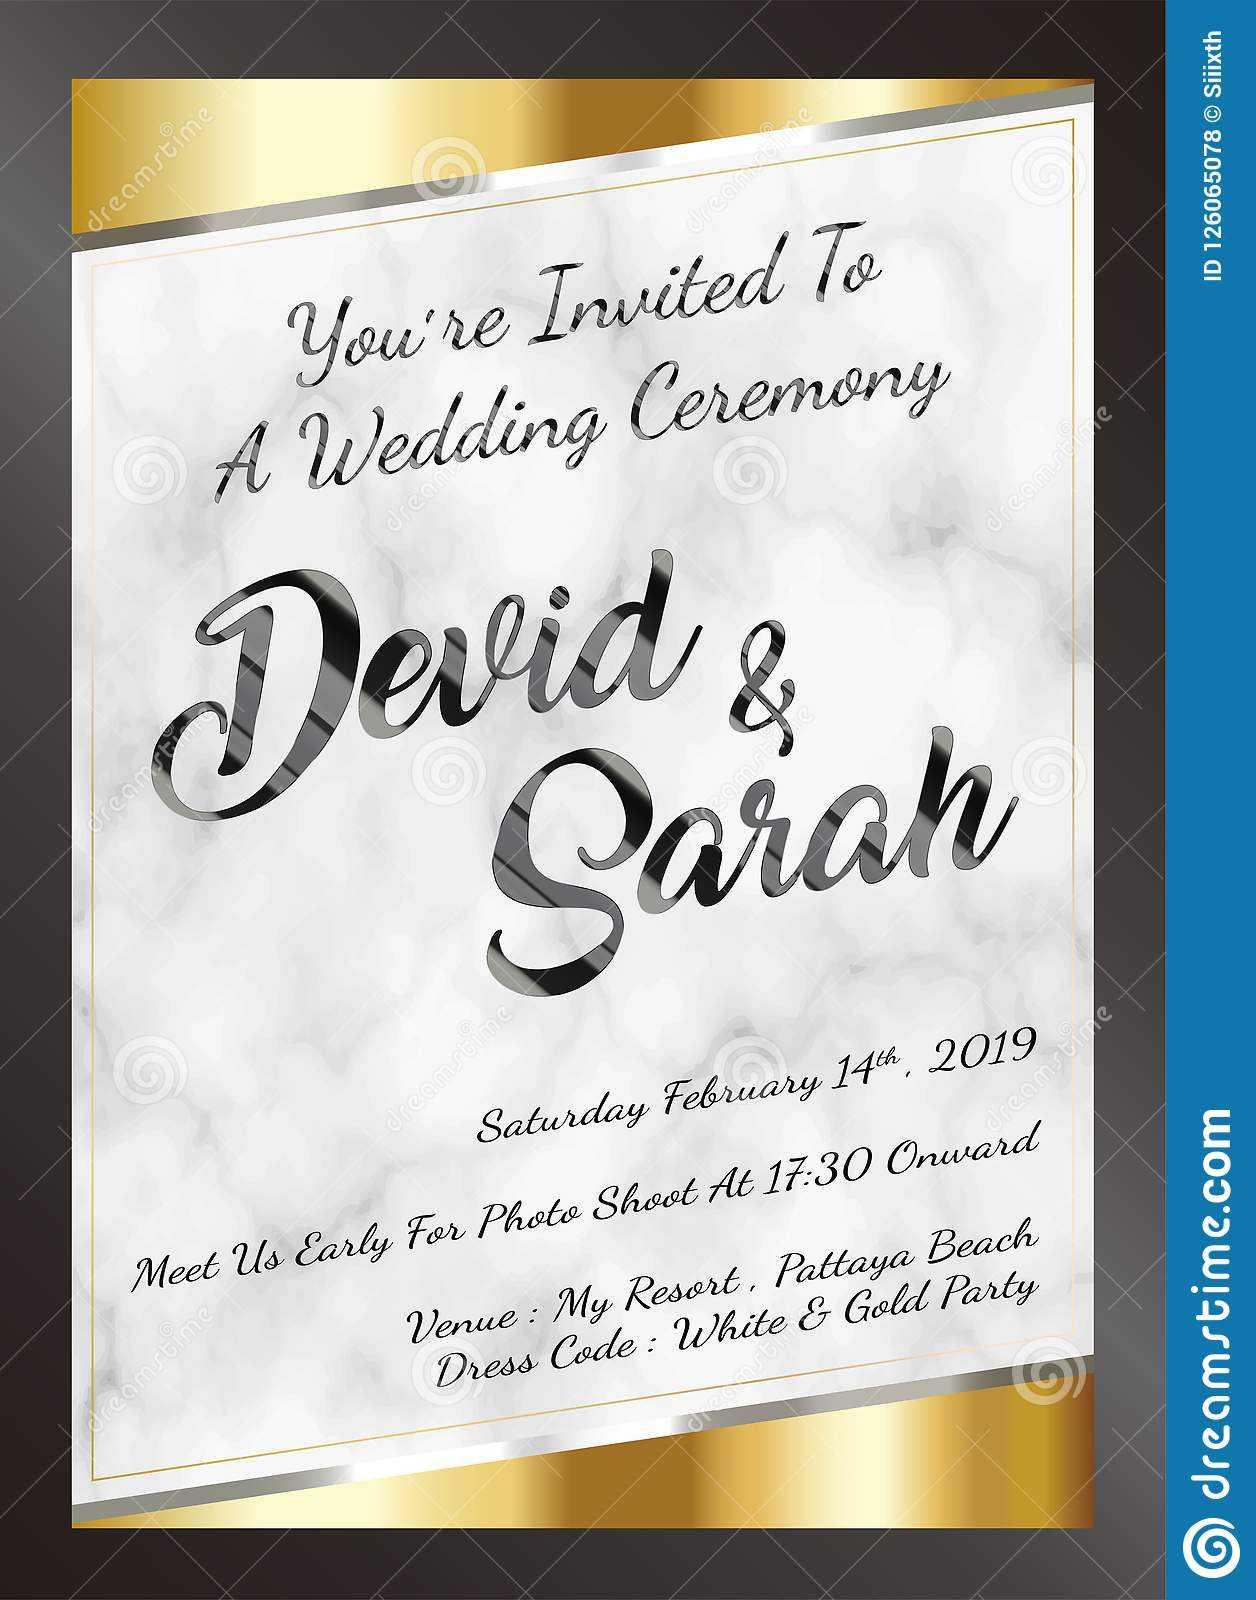 Sample Wedding Card Invitation Template Vector Eps Stock For Sample Wedding Invitation Cards Templates